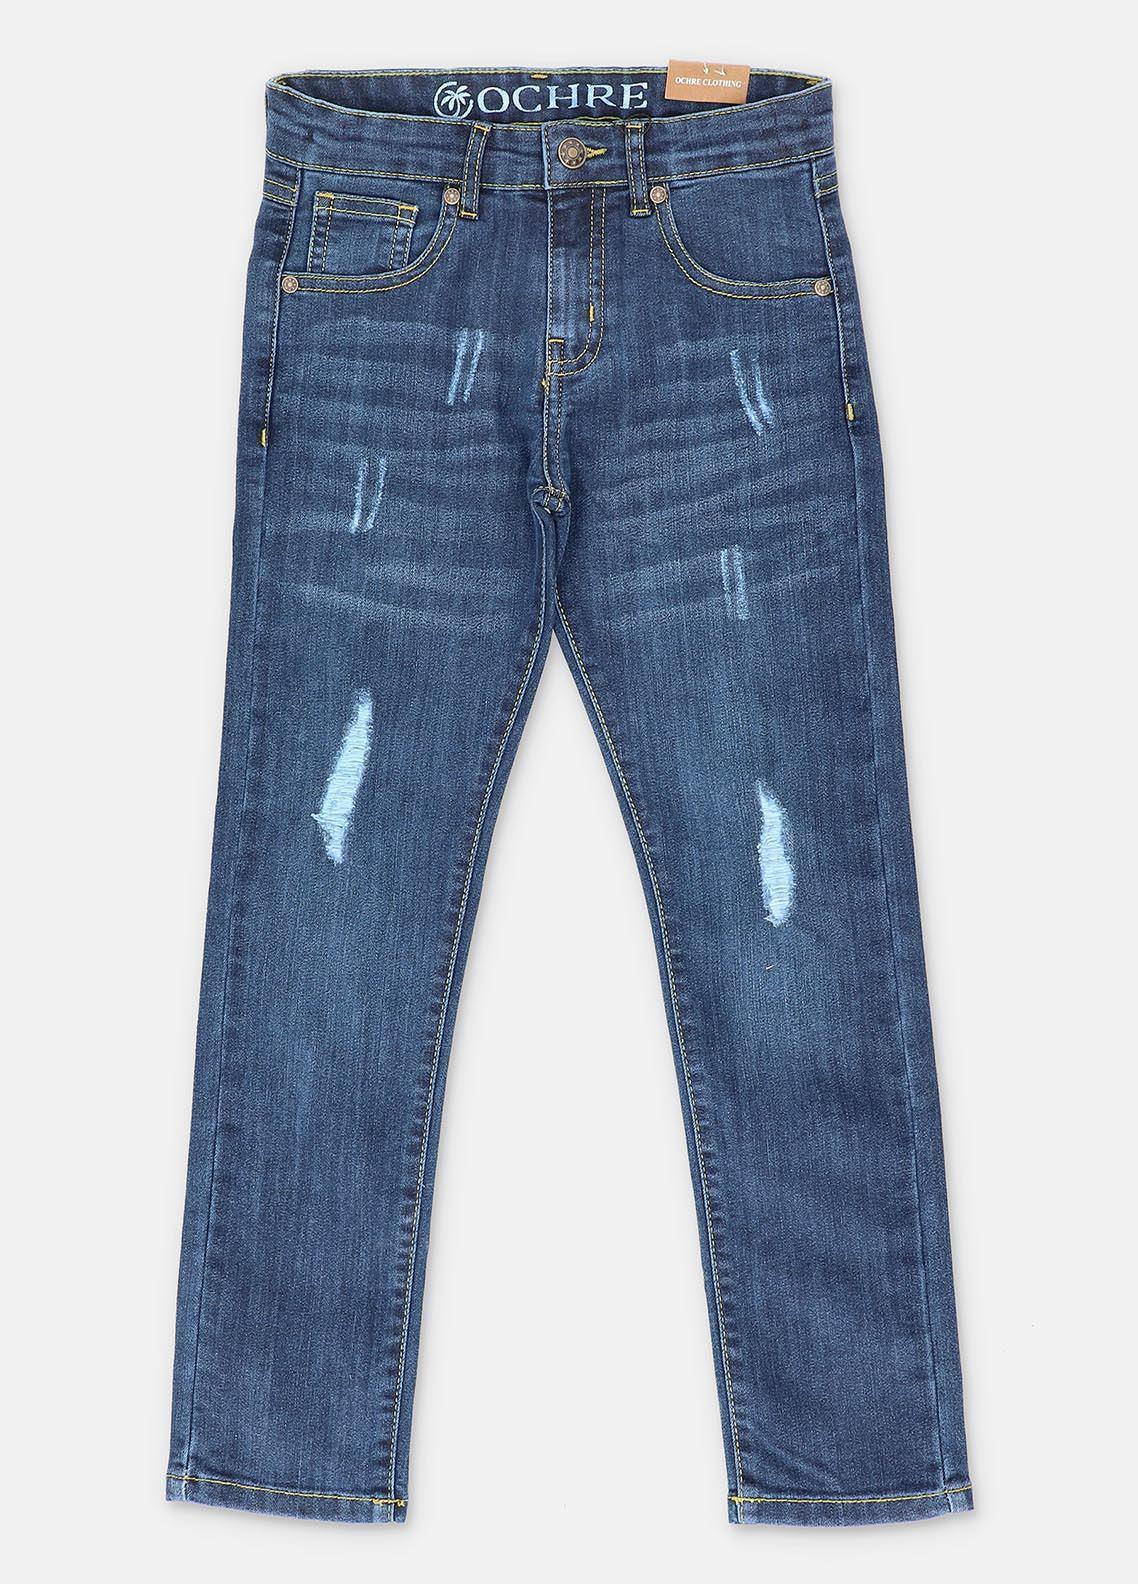 Ochre Denim  Girls Jeans -  ODP-11 Blue